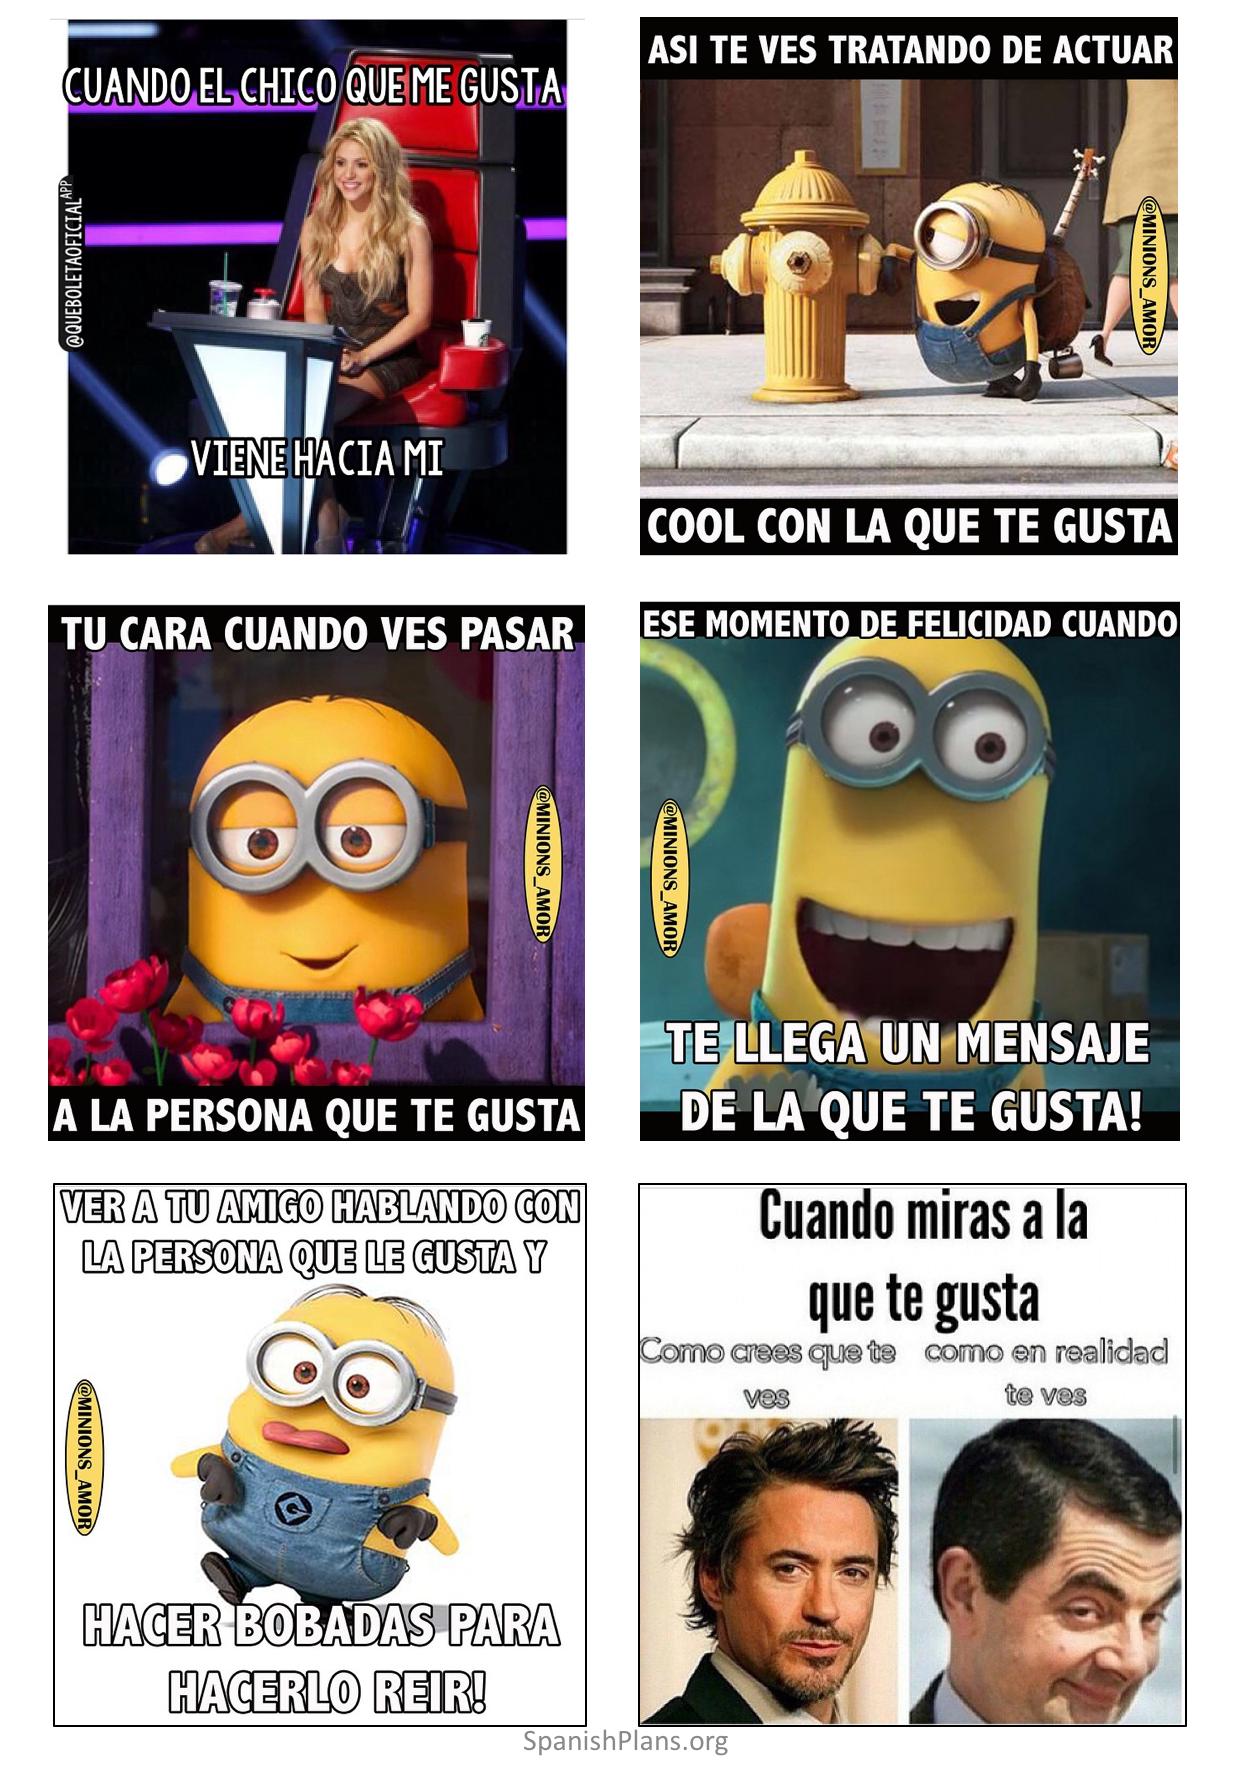 Me Gusta Vs Me Cae Bien Funny Spanish Memes Funny Memes Spanish Jokes